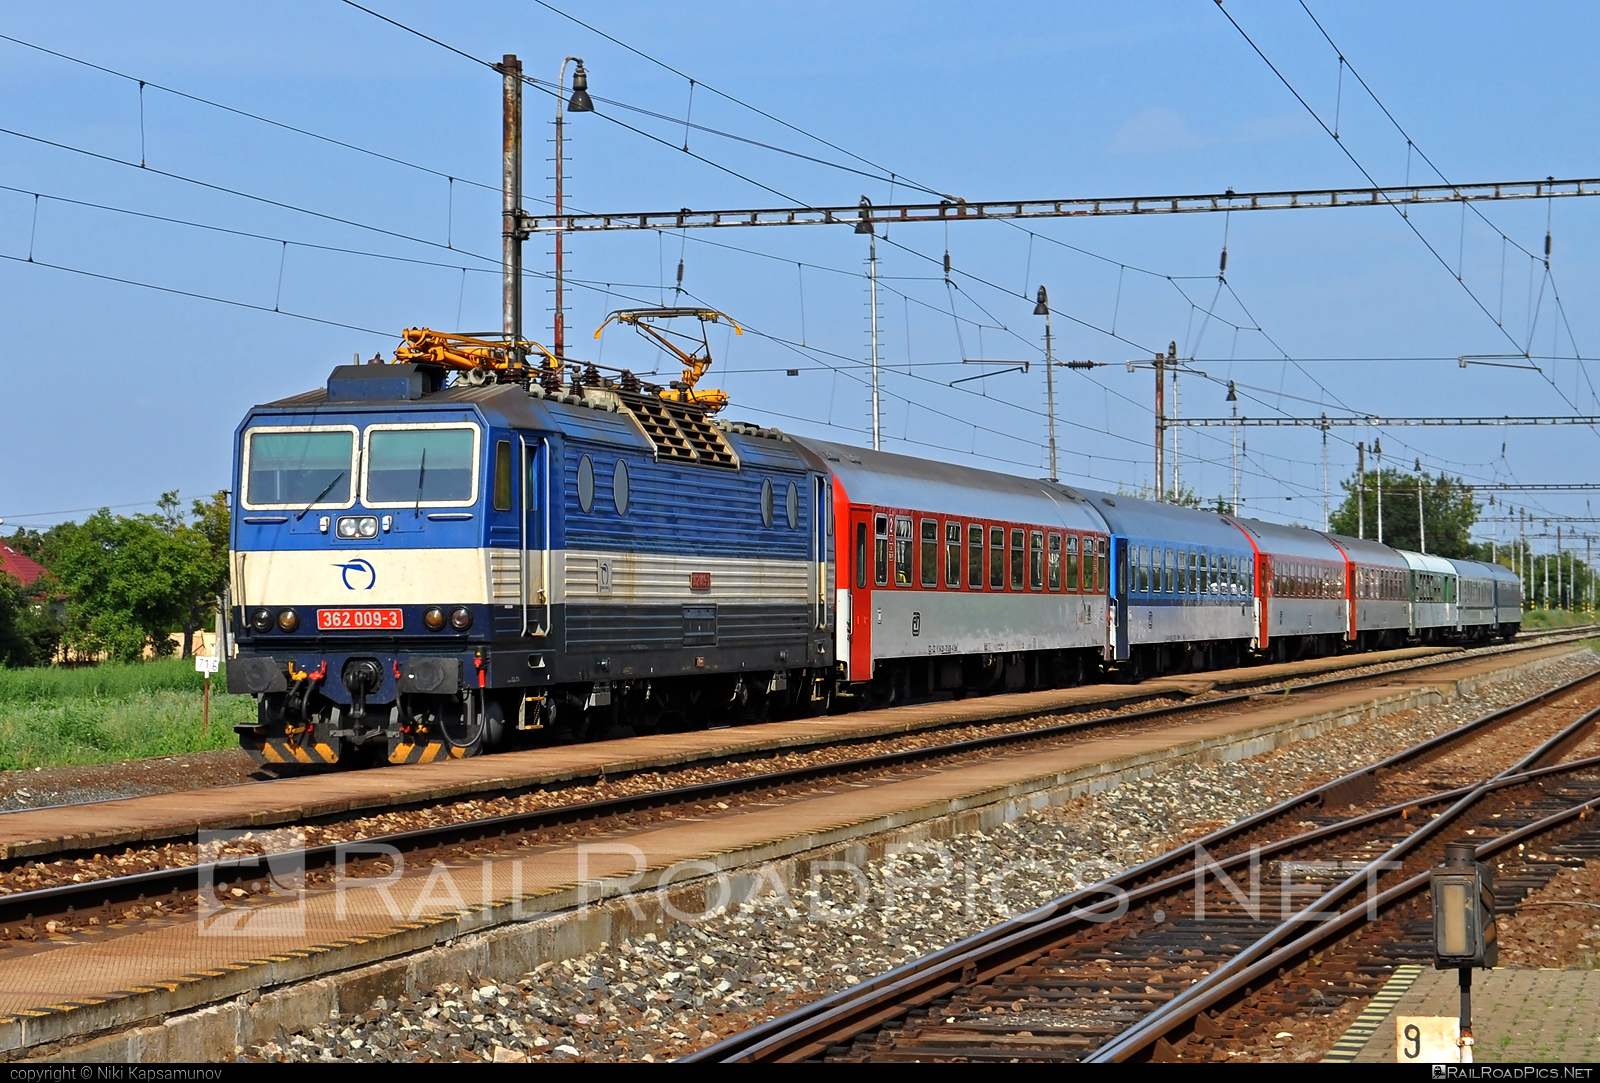 Škoda 69Er - 362 009-3 operated by Železničná Spoločnost' Slovensko, a.s. #ZeleznicnaSpolocnostSlovensko #eso #locomotive362 #rychleeso #skoda #skoda69er #zssk